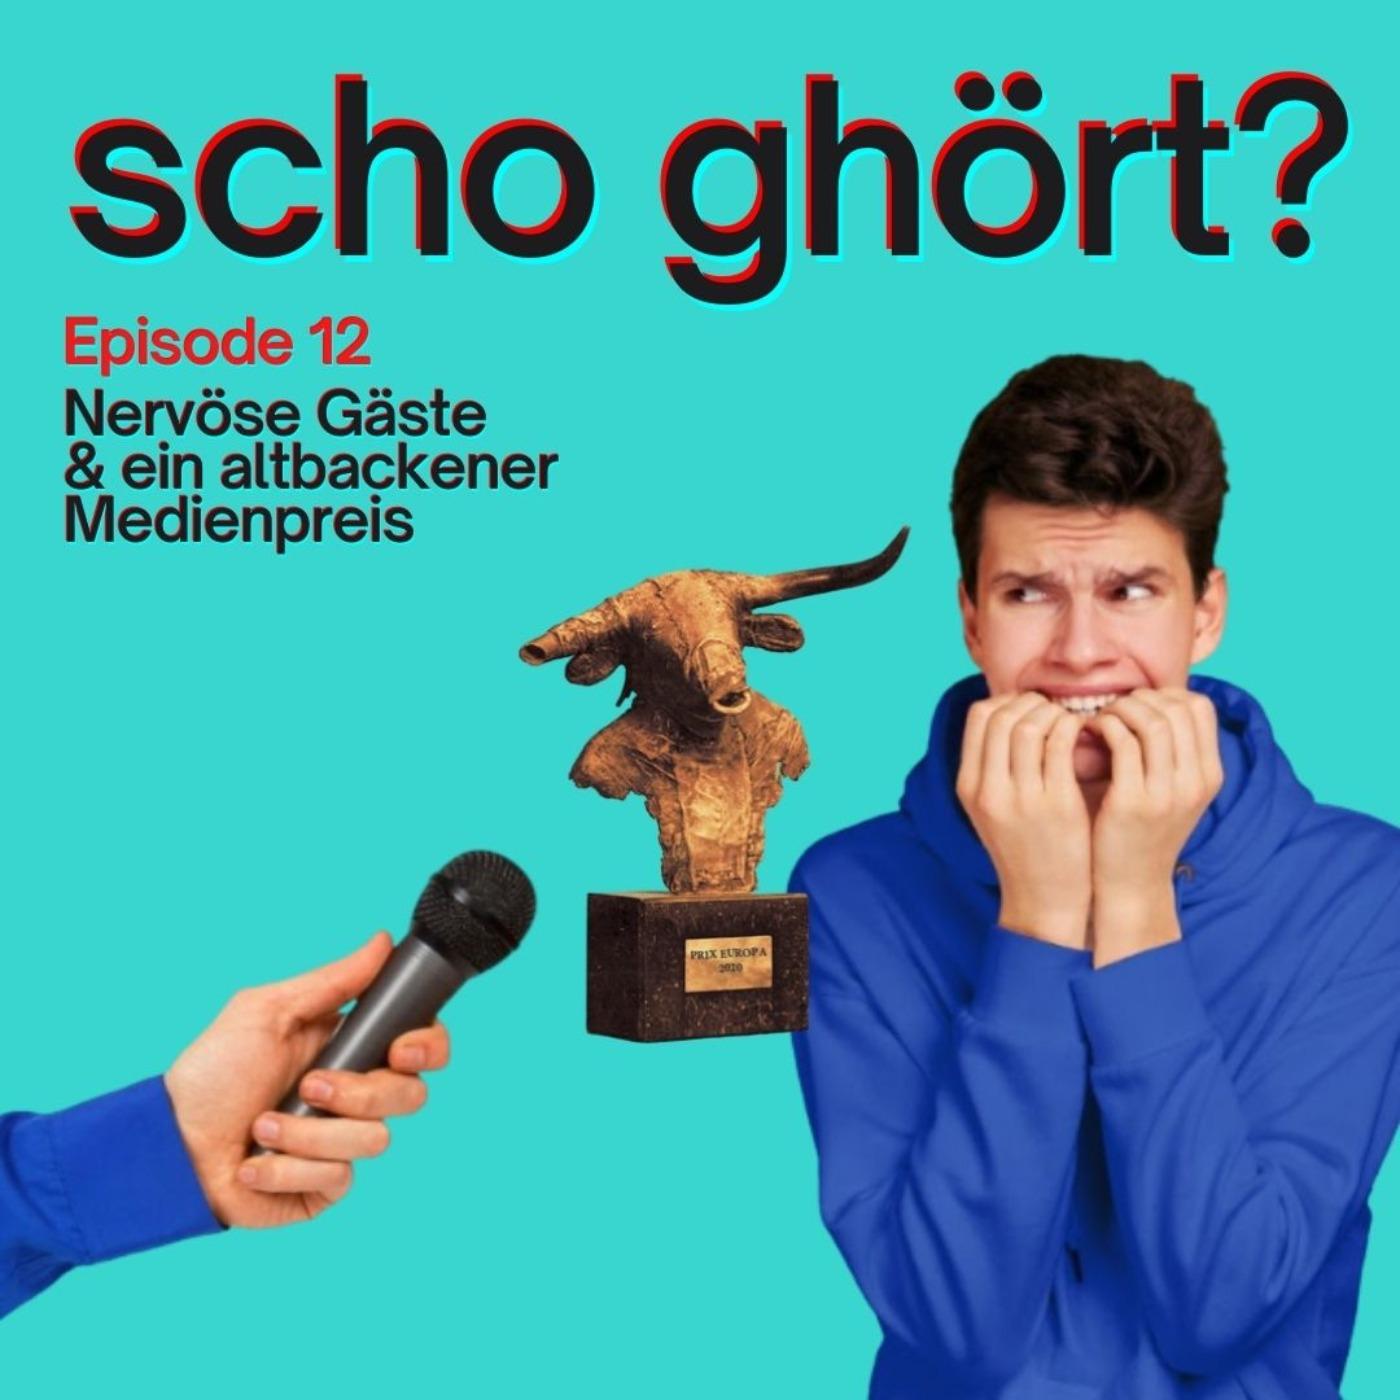 Artwork for podcast Scho ghört?